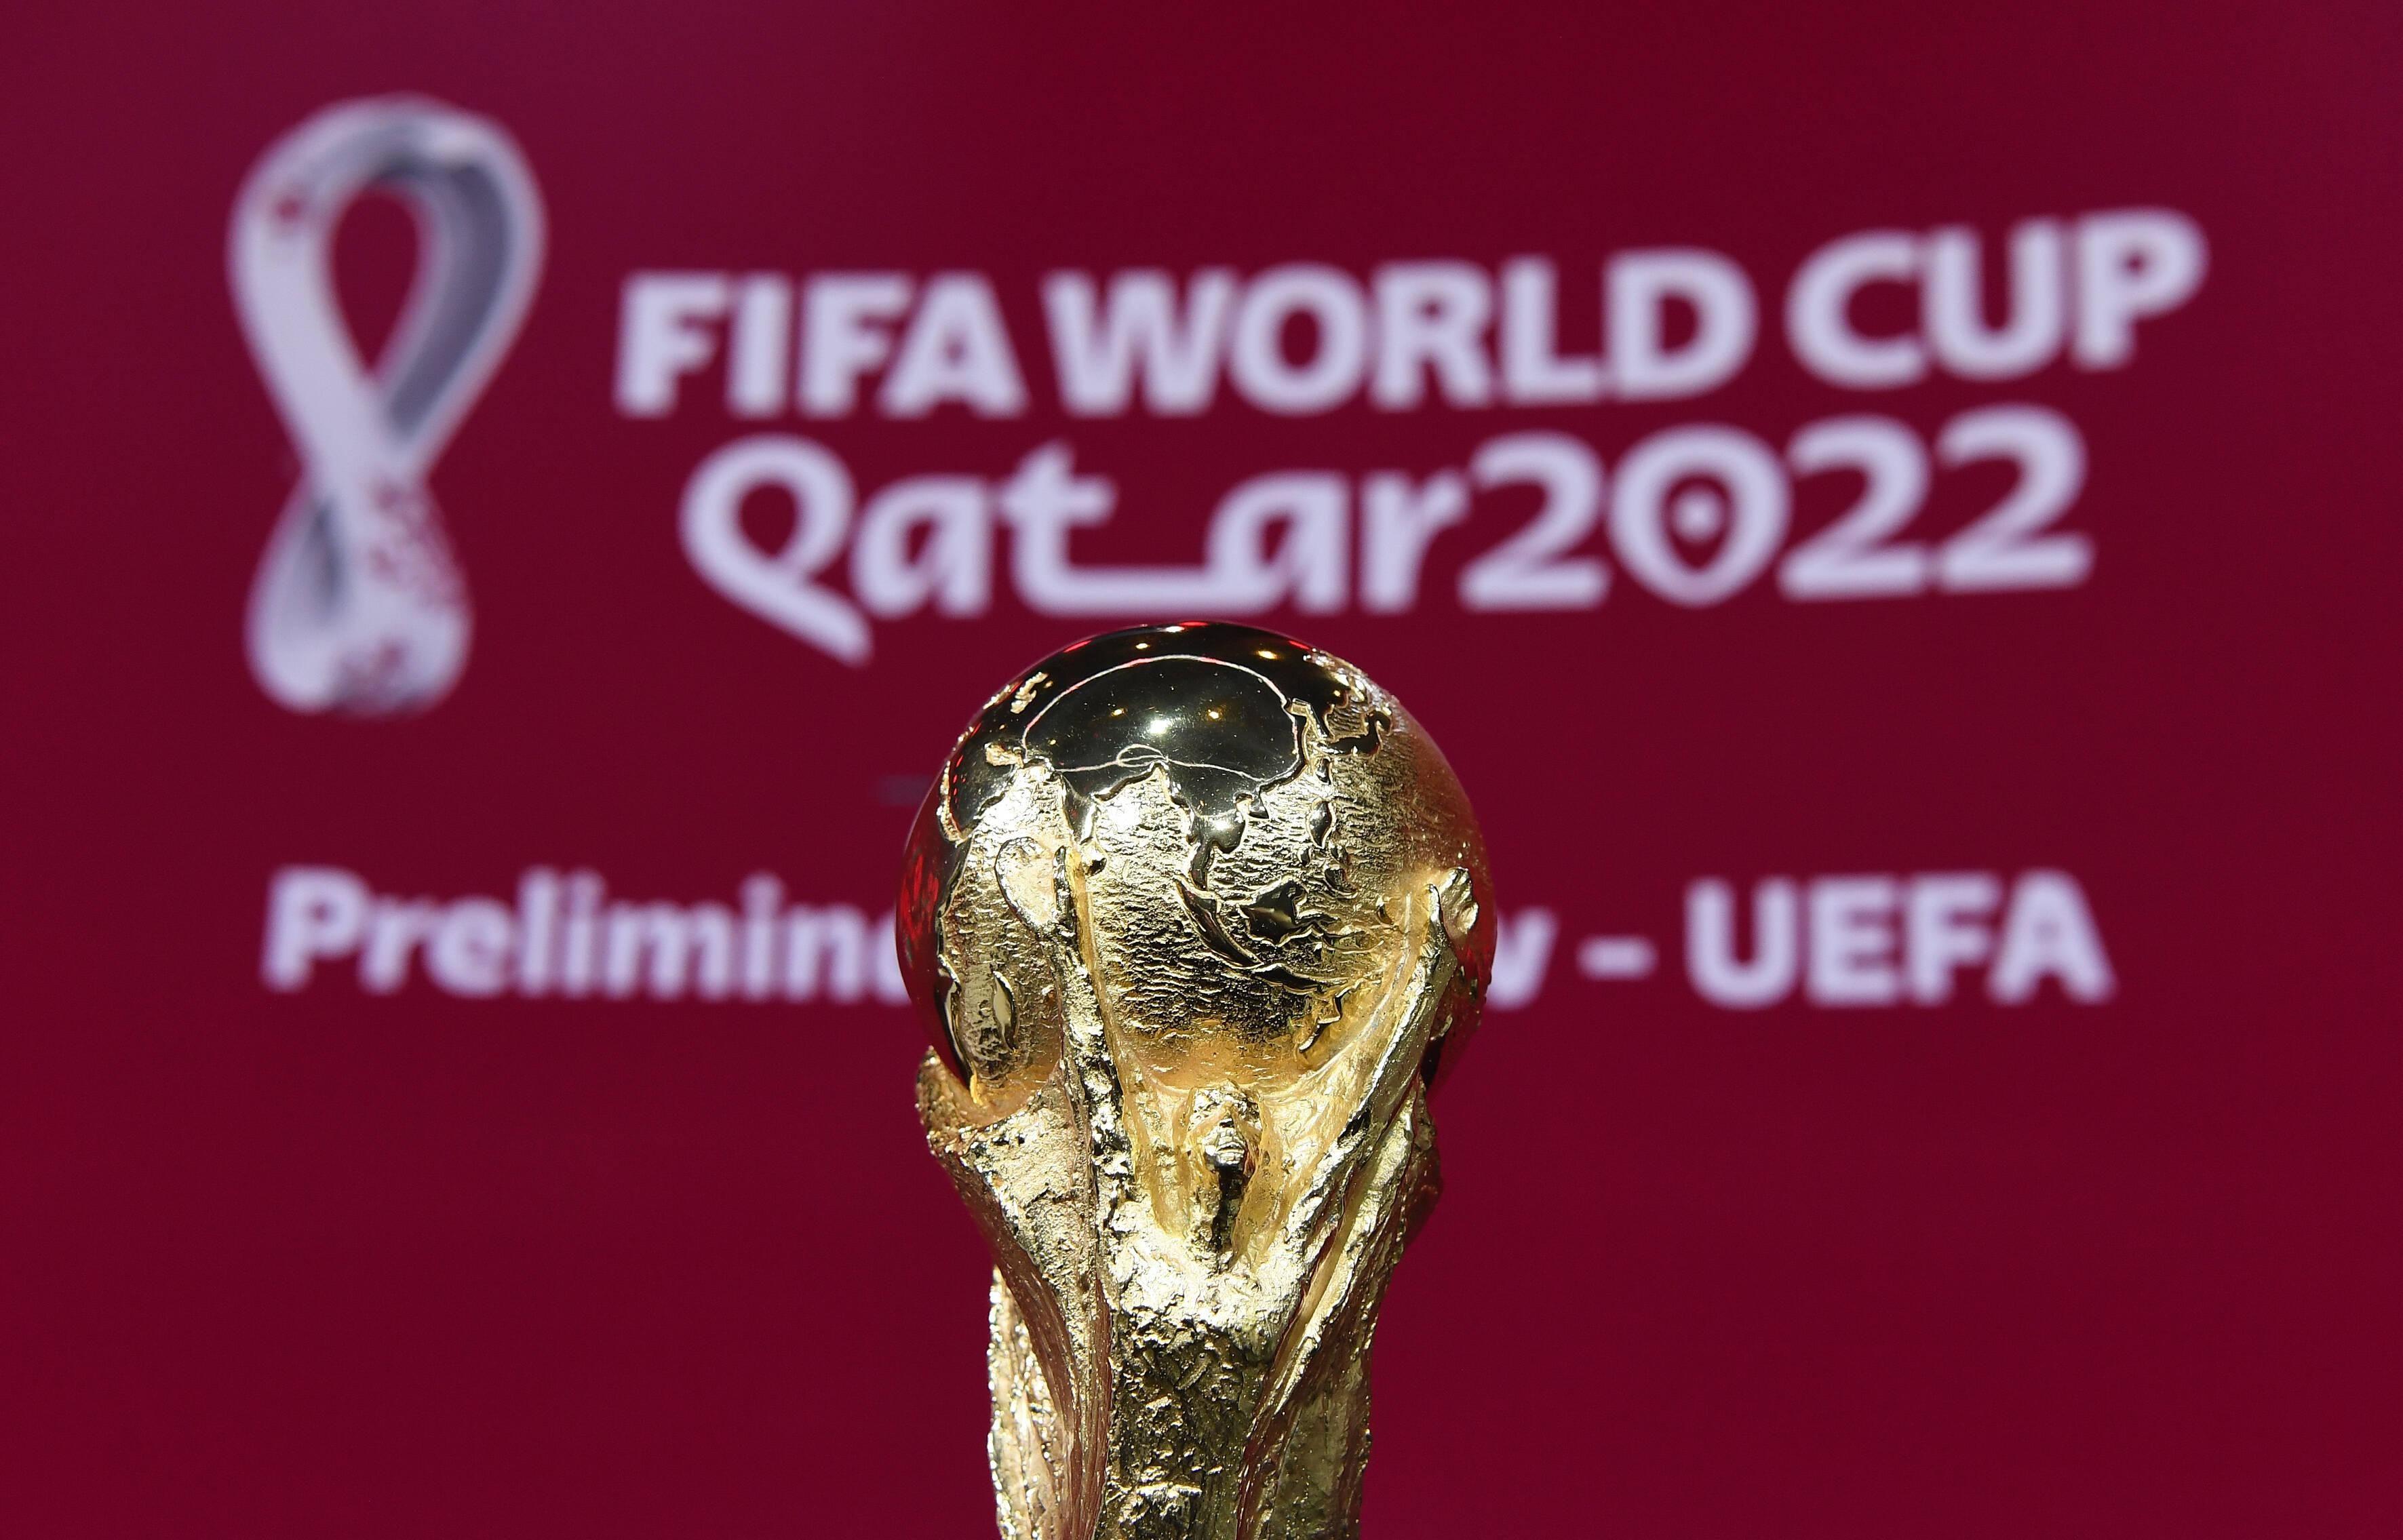 Qatar learns international spotlight can be uncomfortable